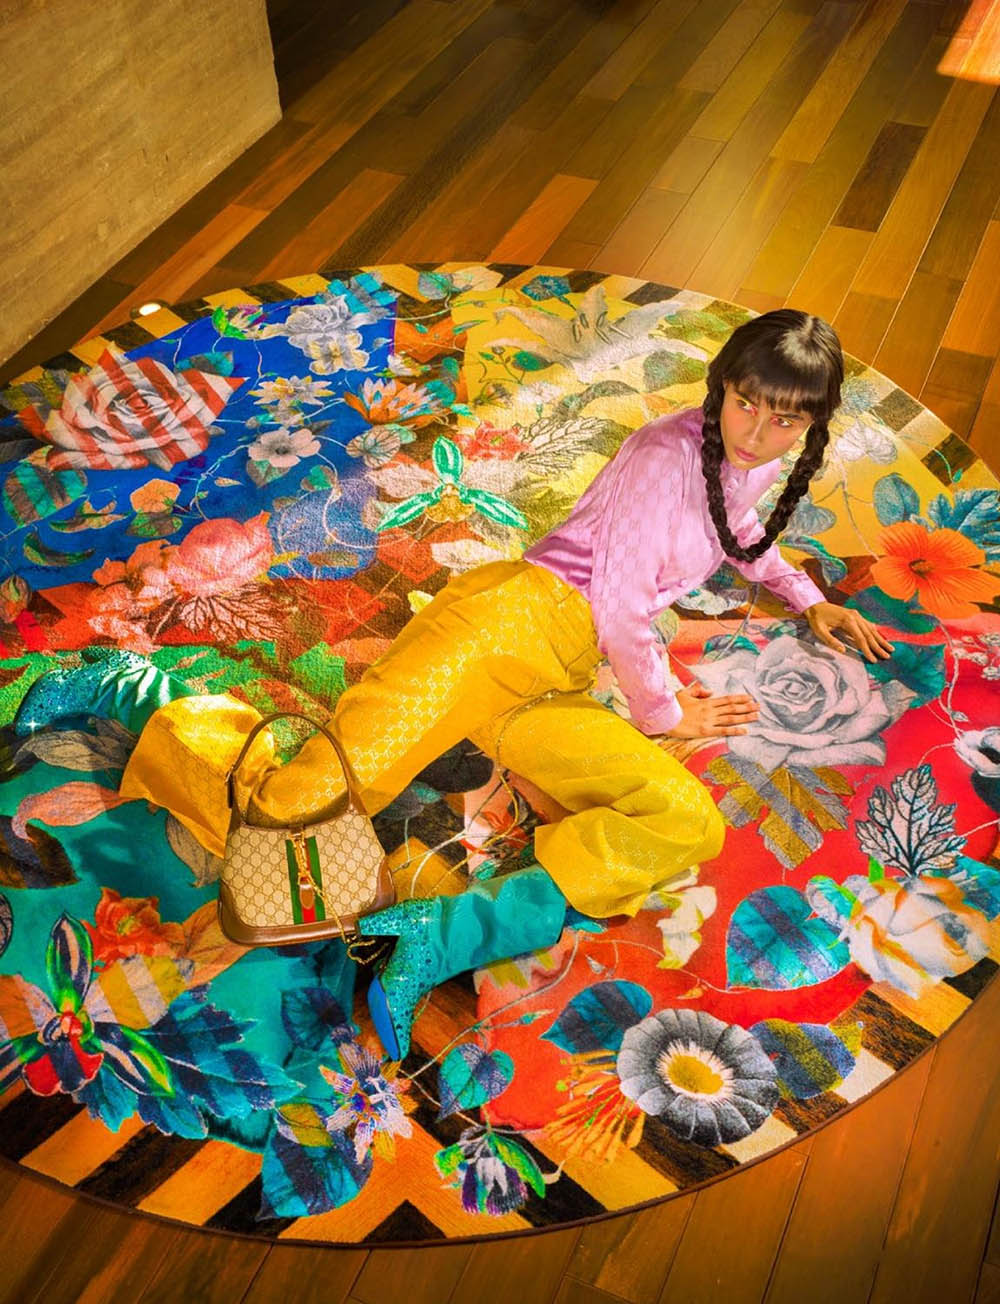 Zaira Mayari by Jvdas Berra for L'Officiel Singapore September 2020